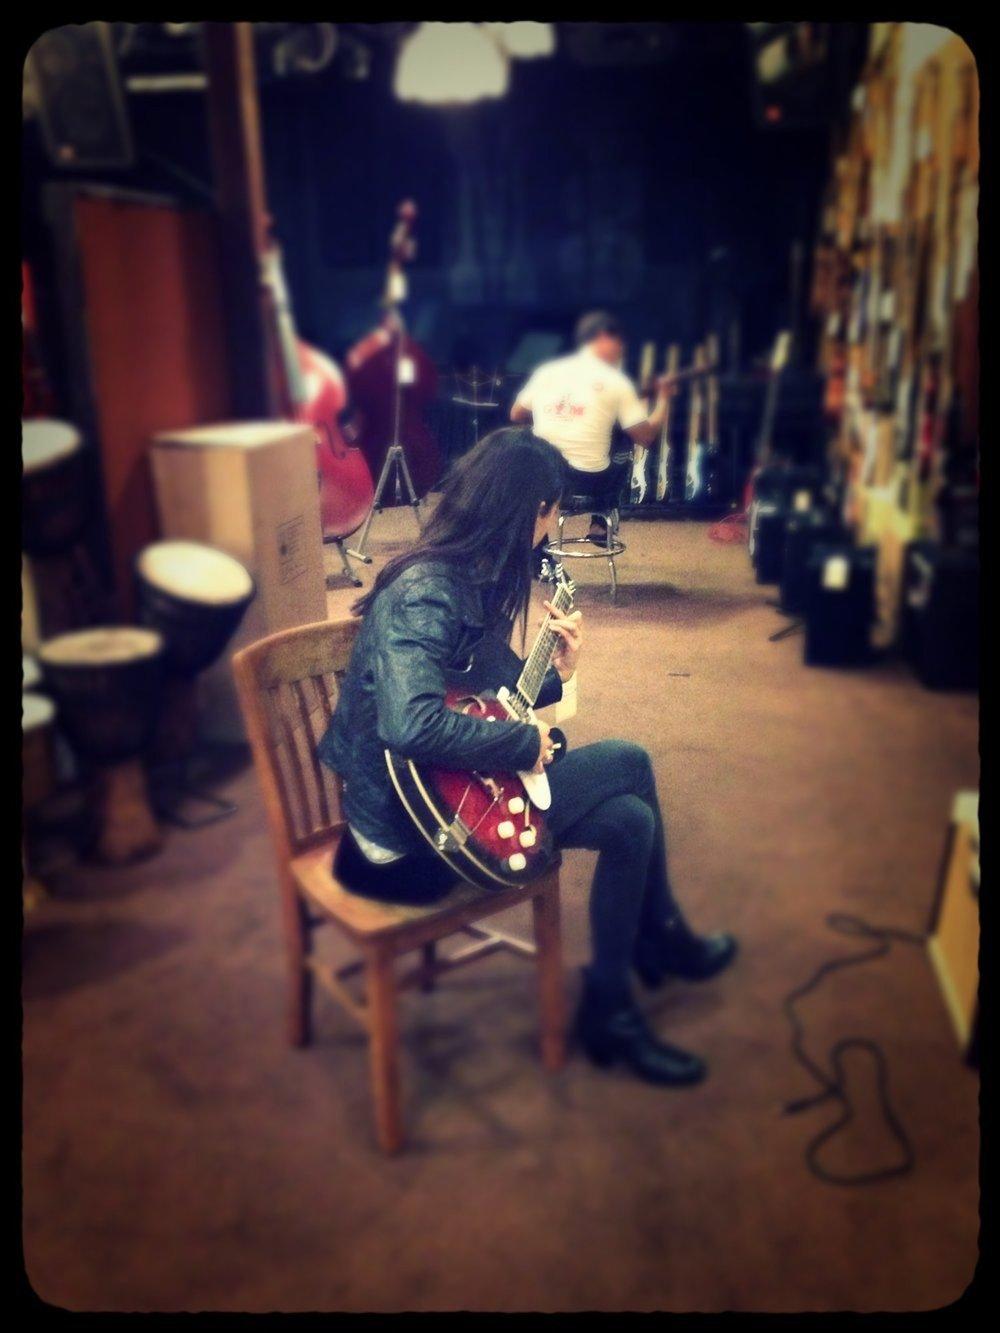 Bek, McCabes Guitar Store, Santa Monica, CA, 2013